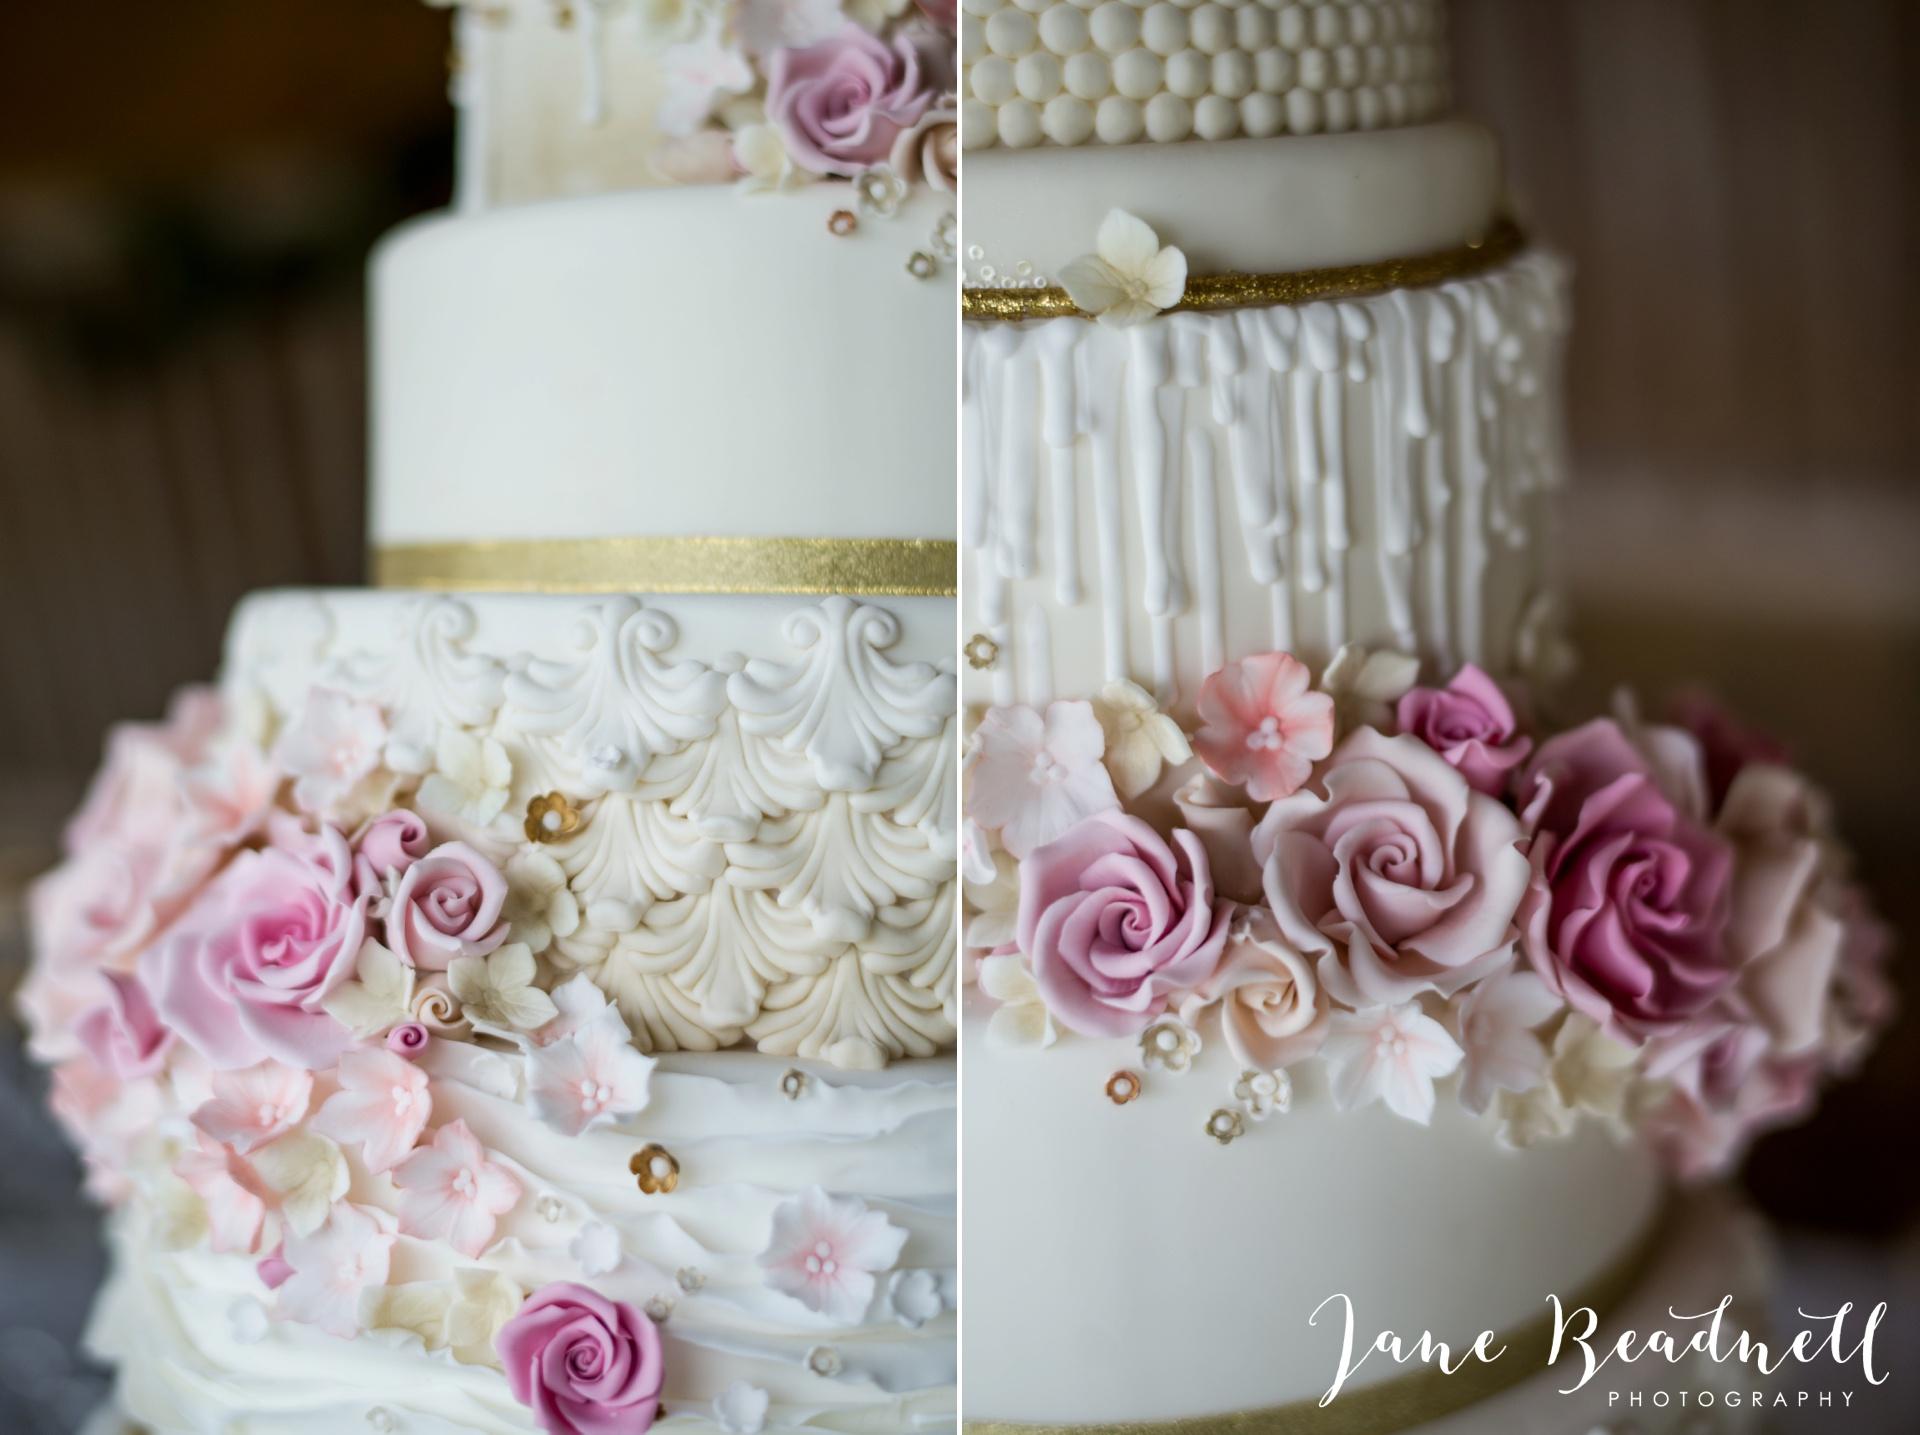 Jane Beadnell fine art wedding photographer Swinton Park3